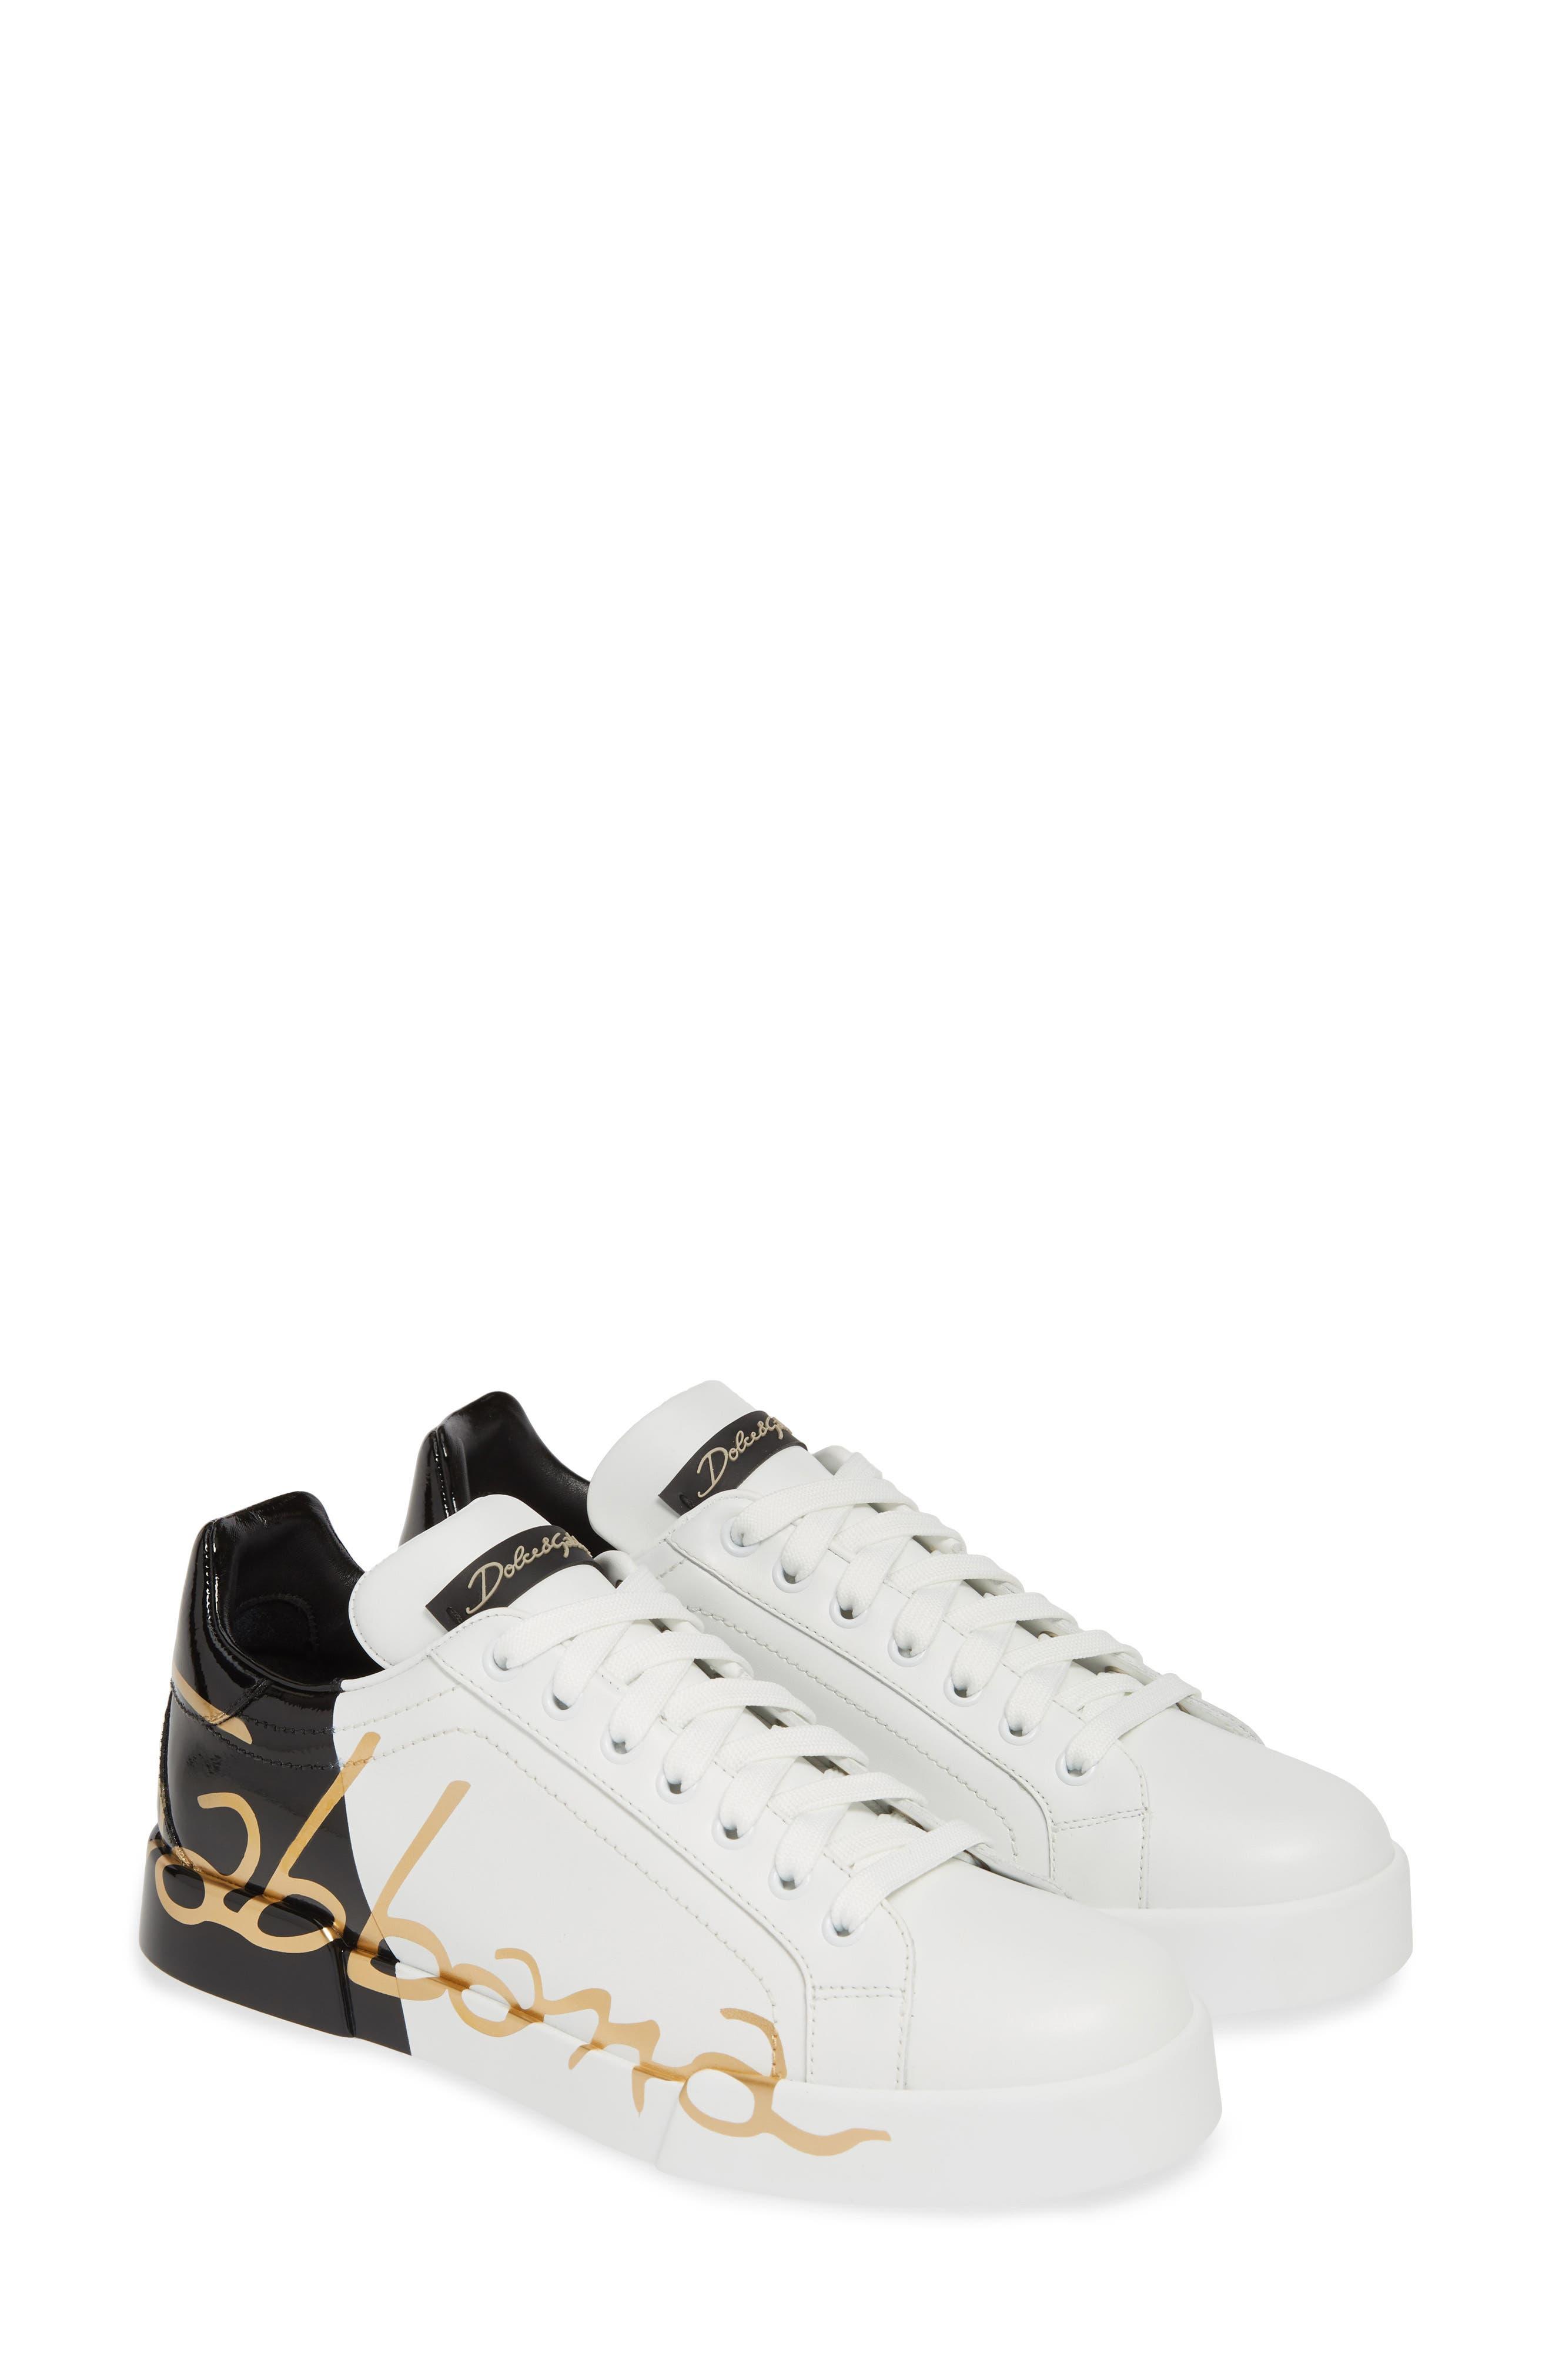 6e455125c74 Women's Dolce&Gabbana Shoes   Nordstrom